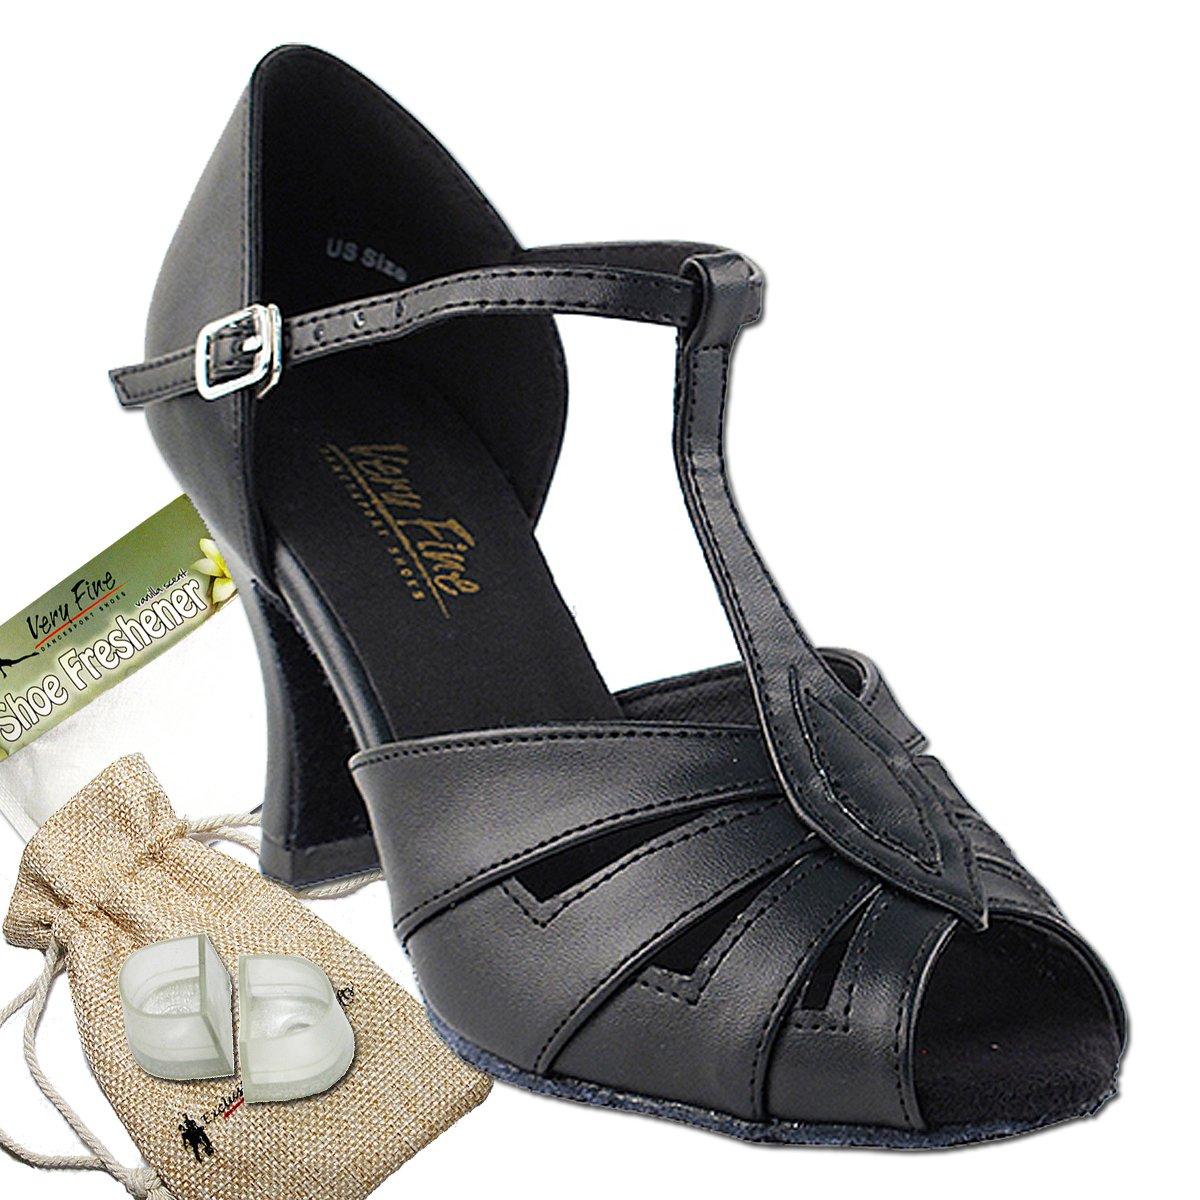 Women's Ballroom Dance Shoes Tango Wedding Salsa Dance Shoes Black Leather 2702EB Comfortable - Very Fine 3'' Heel 8.5 M US [Bundle of 5]